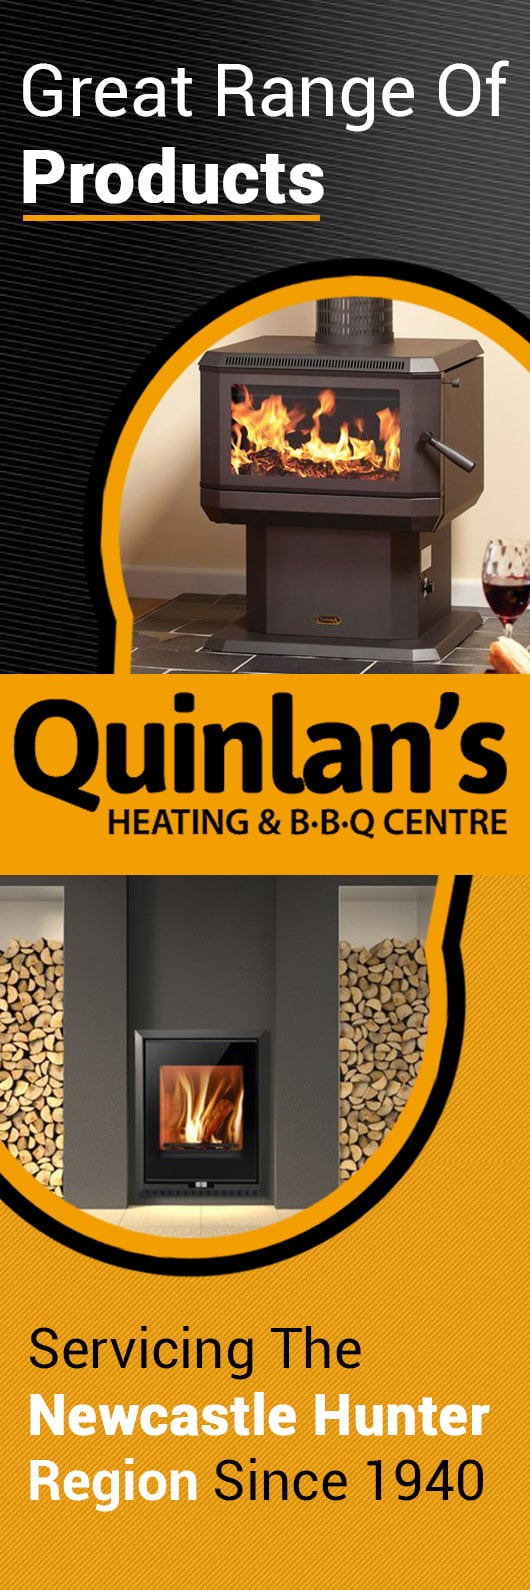 quinlan u0027s heating u0026 b b q centre fireplaces u0026 fireplace